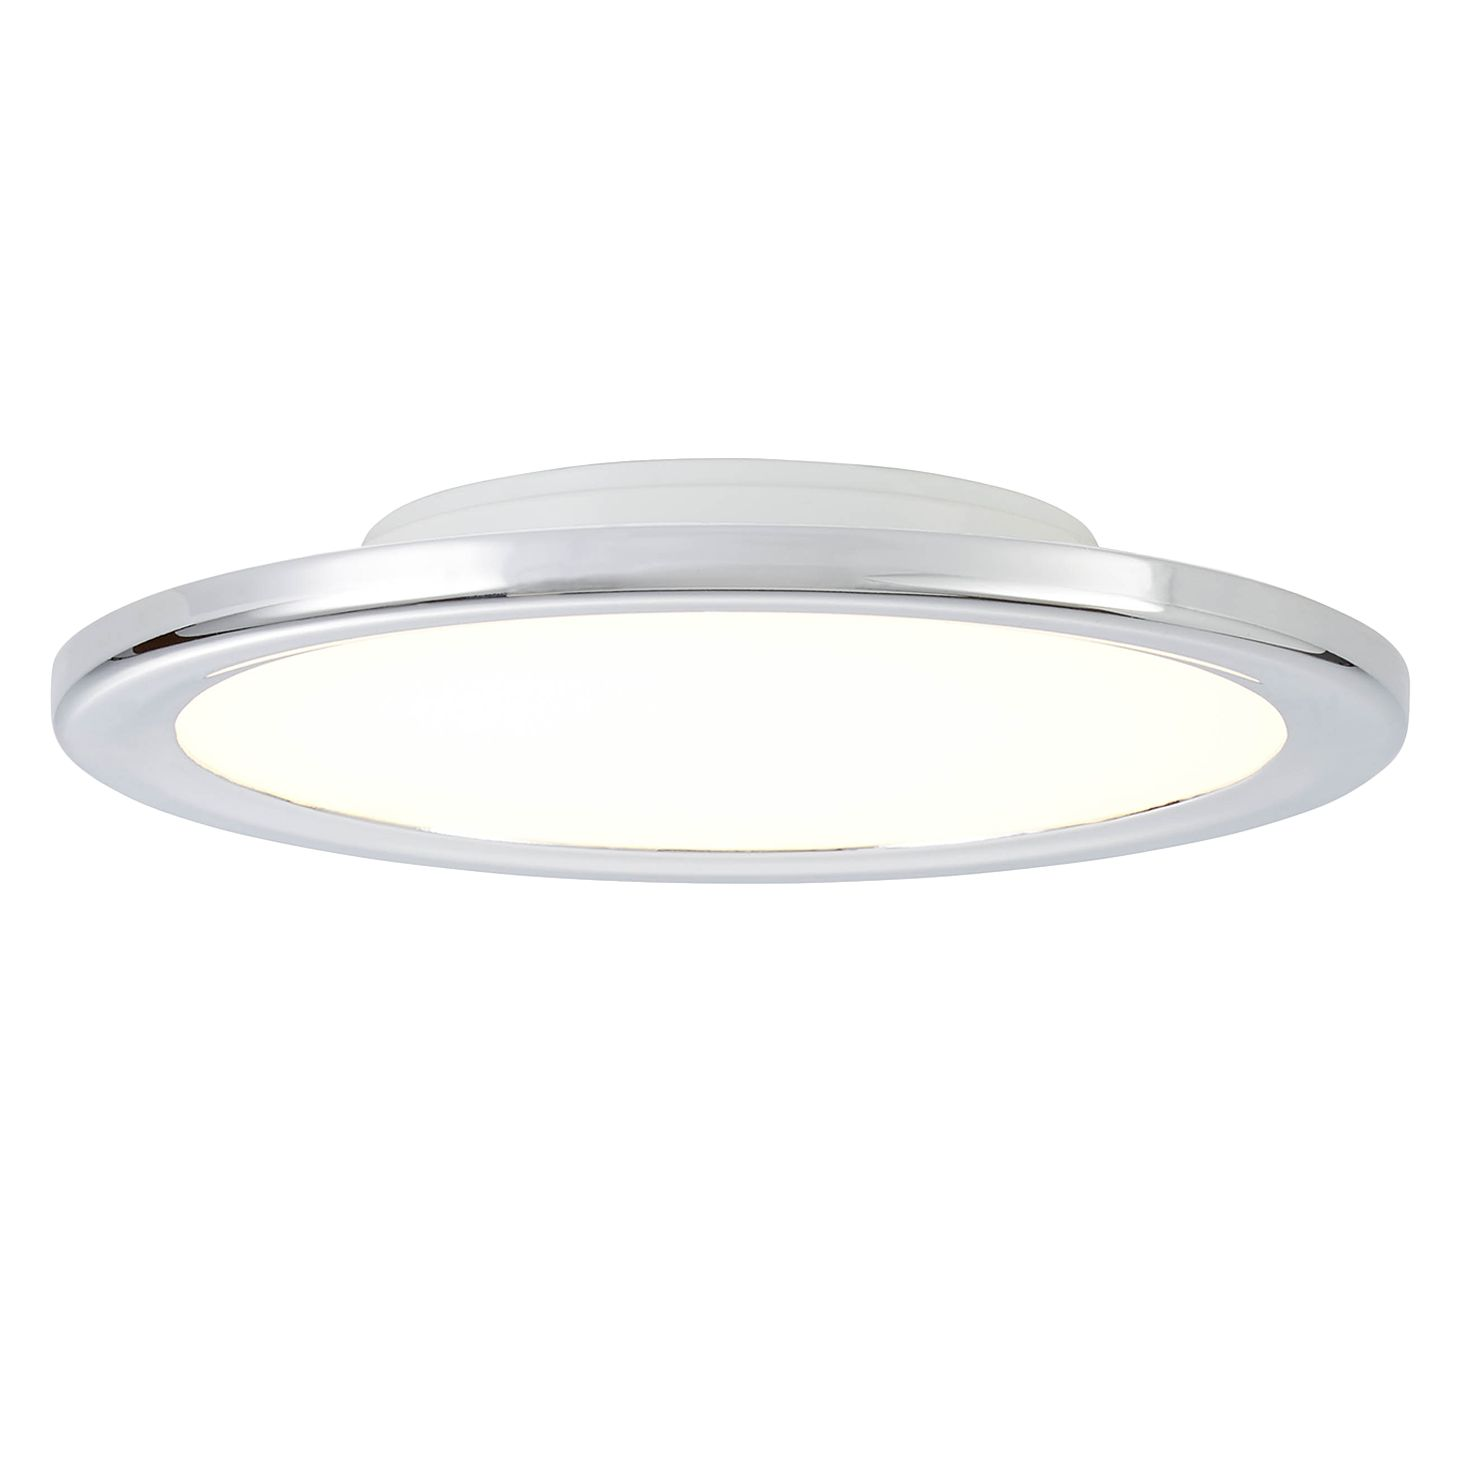 home24 LED-Deckenleuchte Neptune Flat III